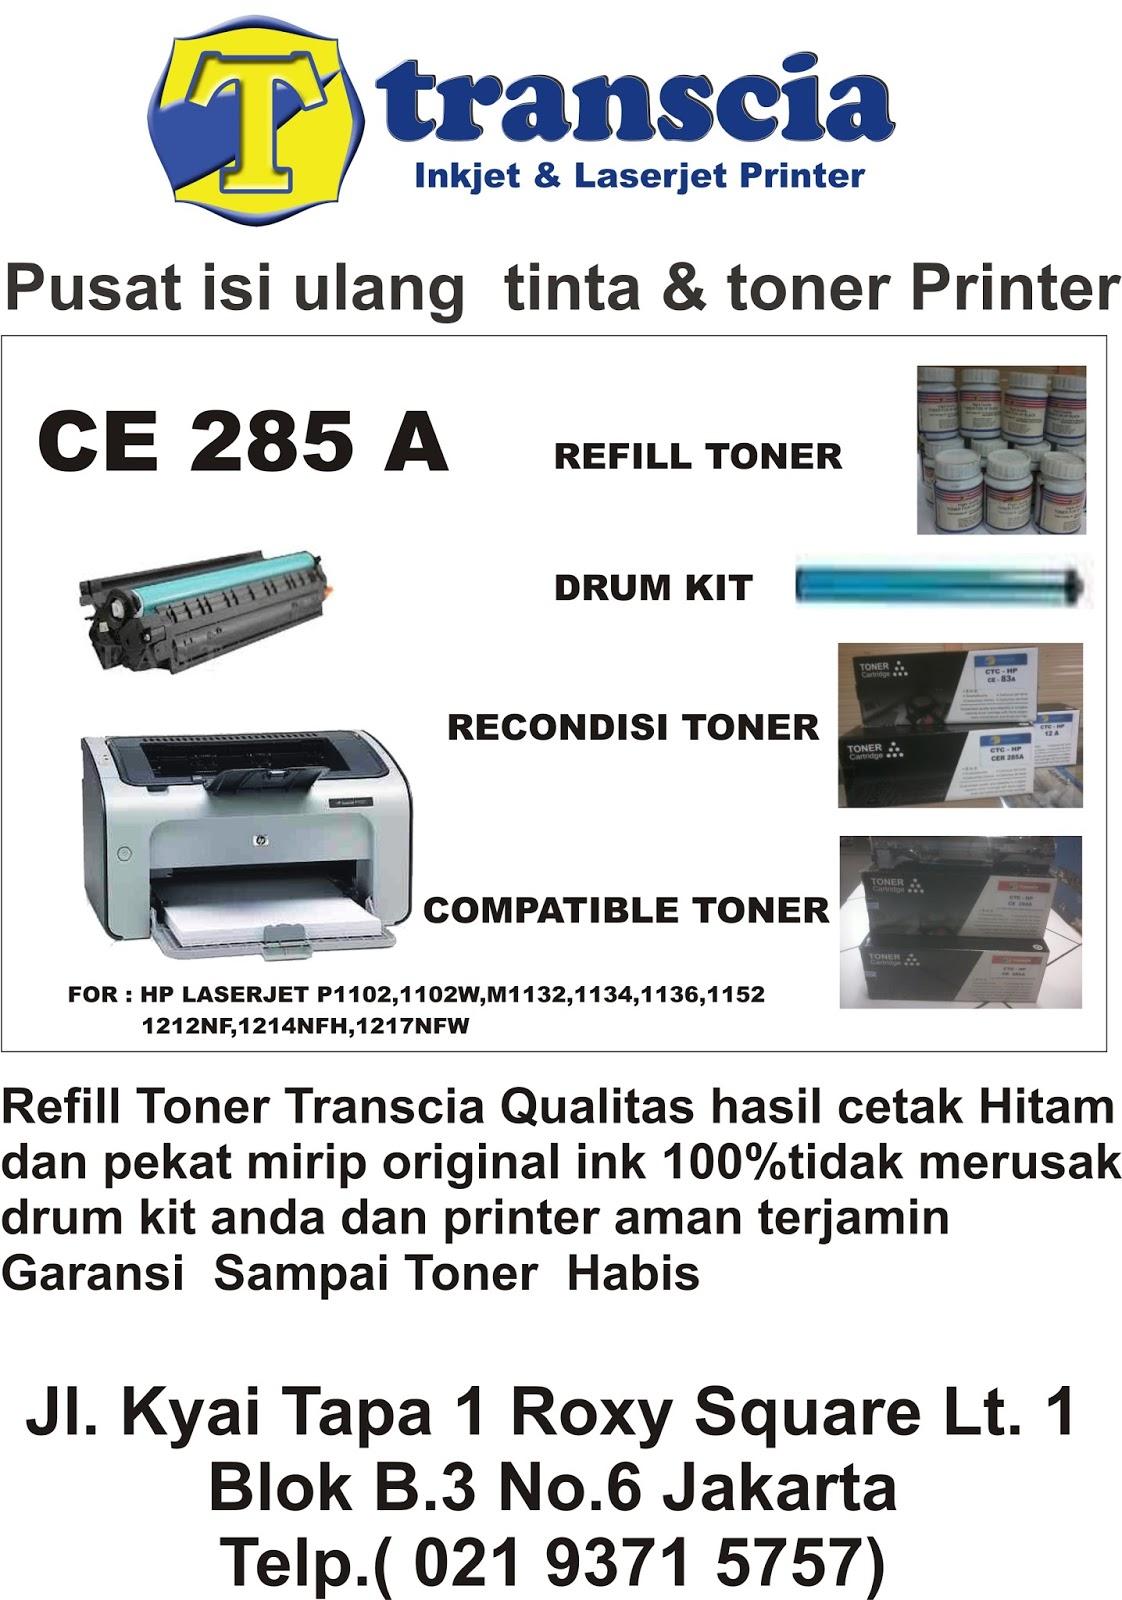 Refill Tinta Toner Printer Inkjet Laserjet Canonhpepsonbrather Hp P1102 M1132 Compatible For P11021102wm1132 11341136111212nf1214nfh1217nfw